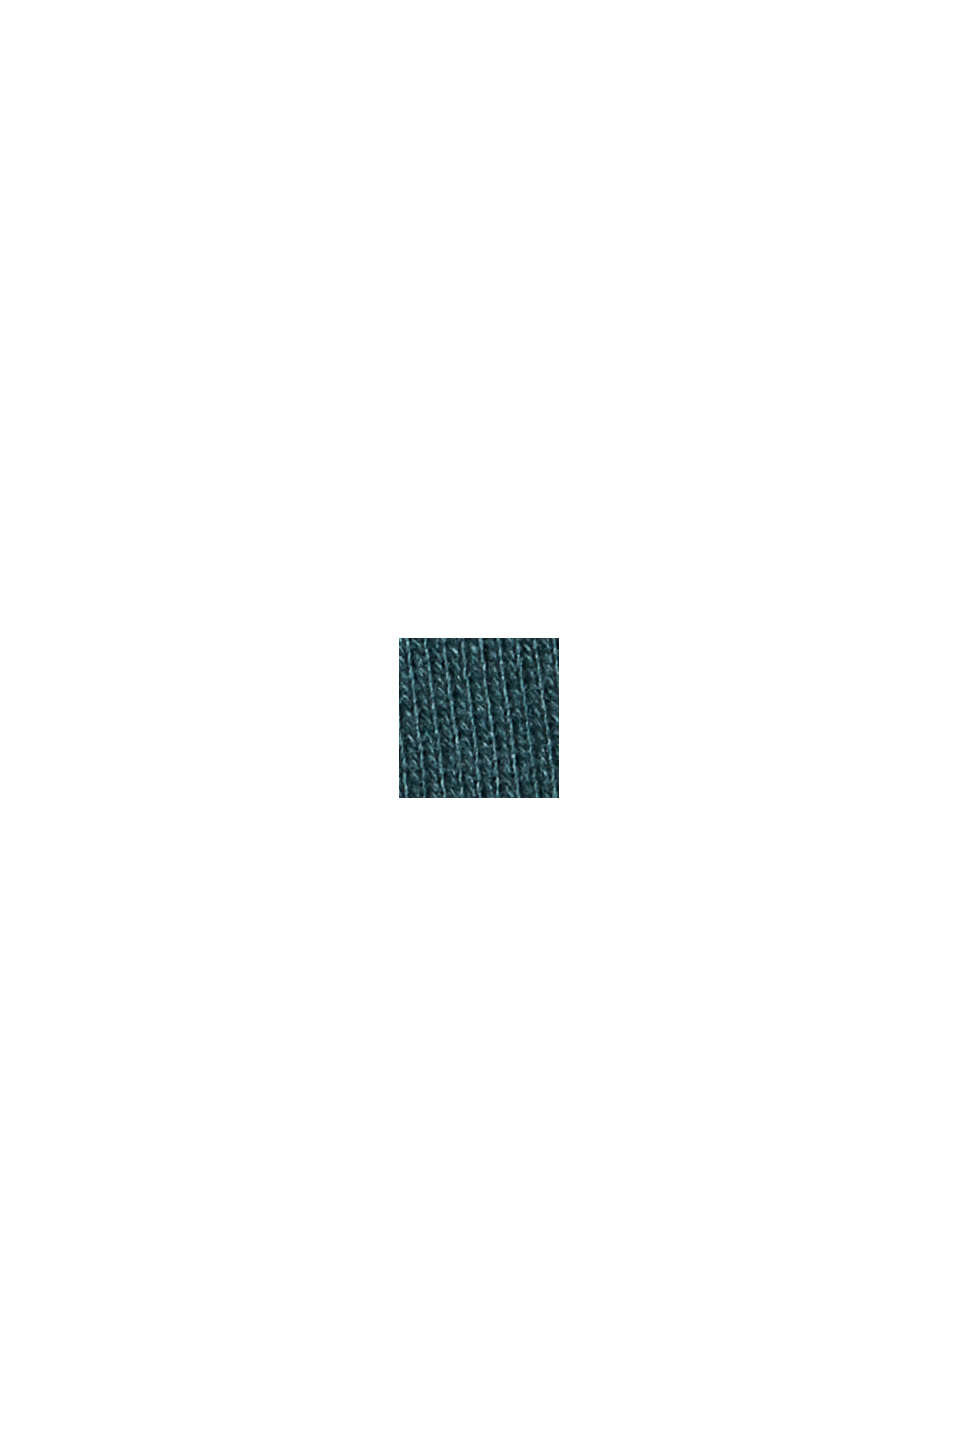 Sweatshirt in 100% cotton, TEAL GREEN, swatch